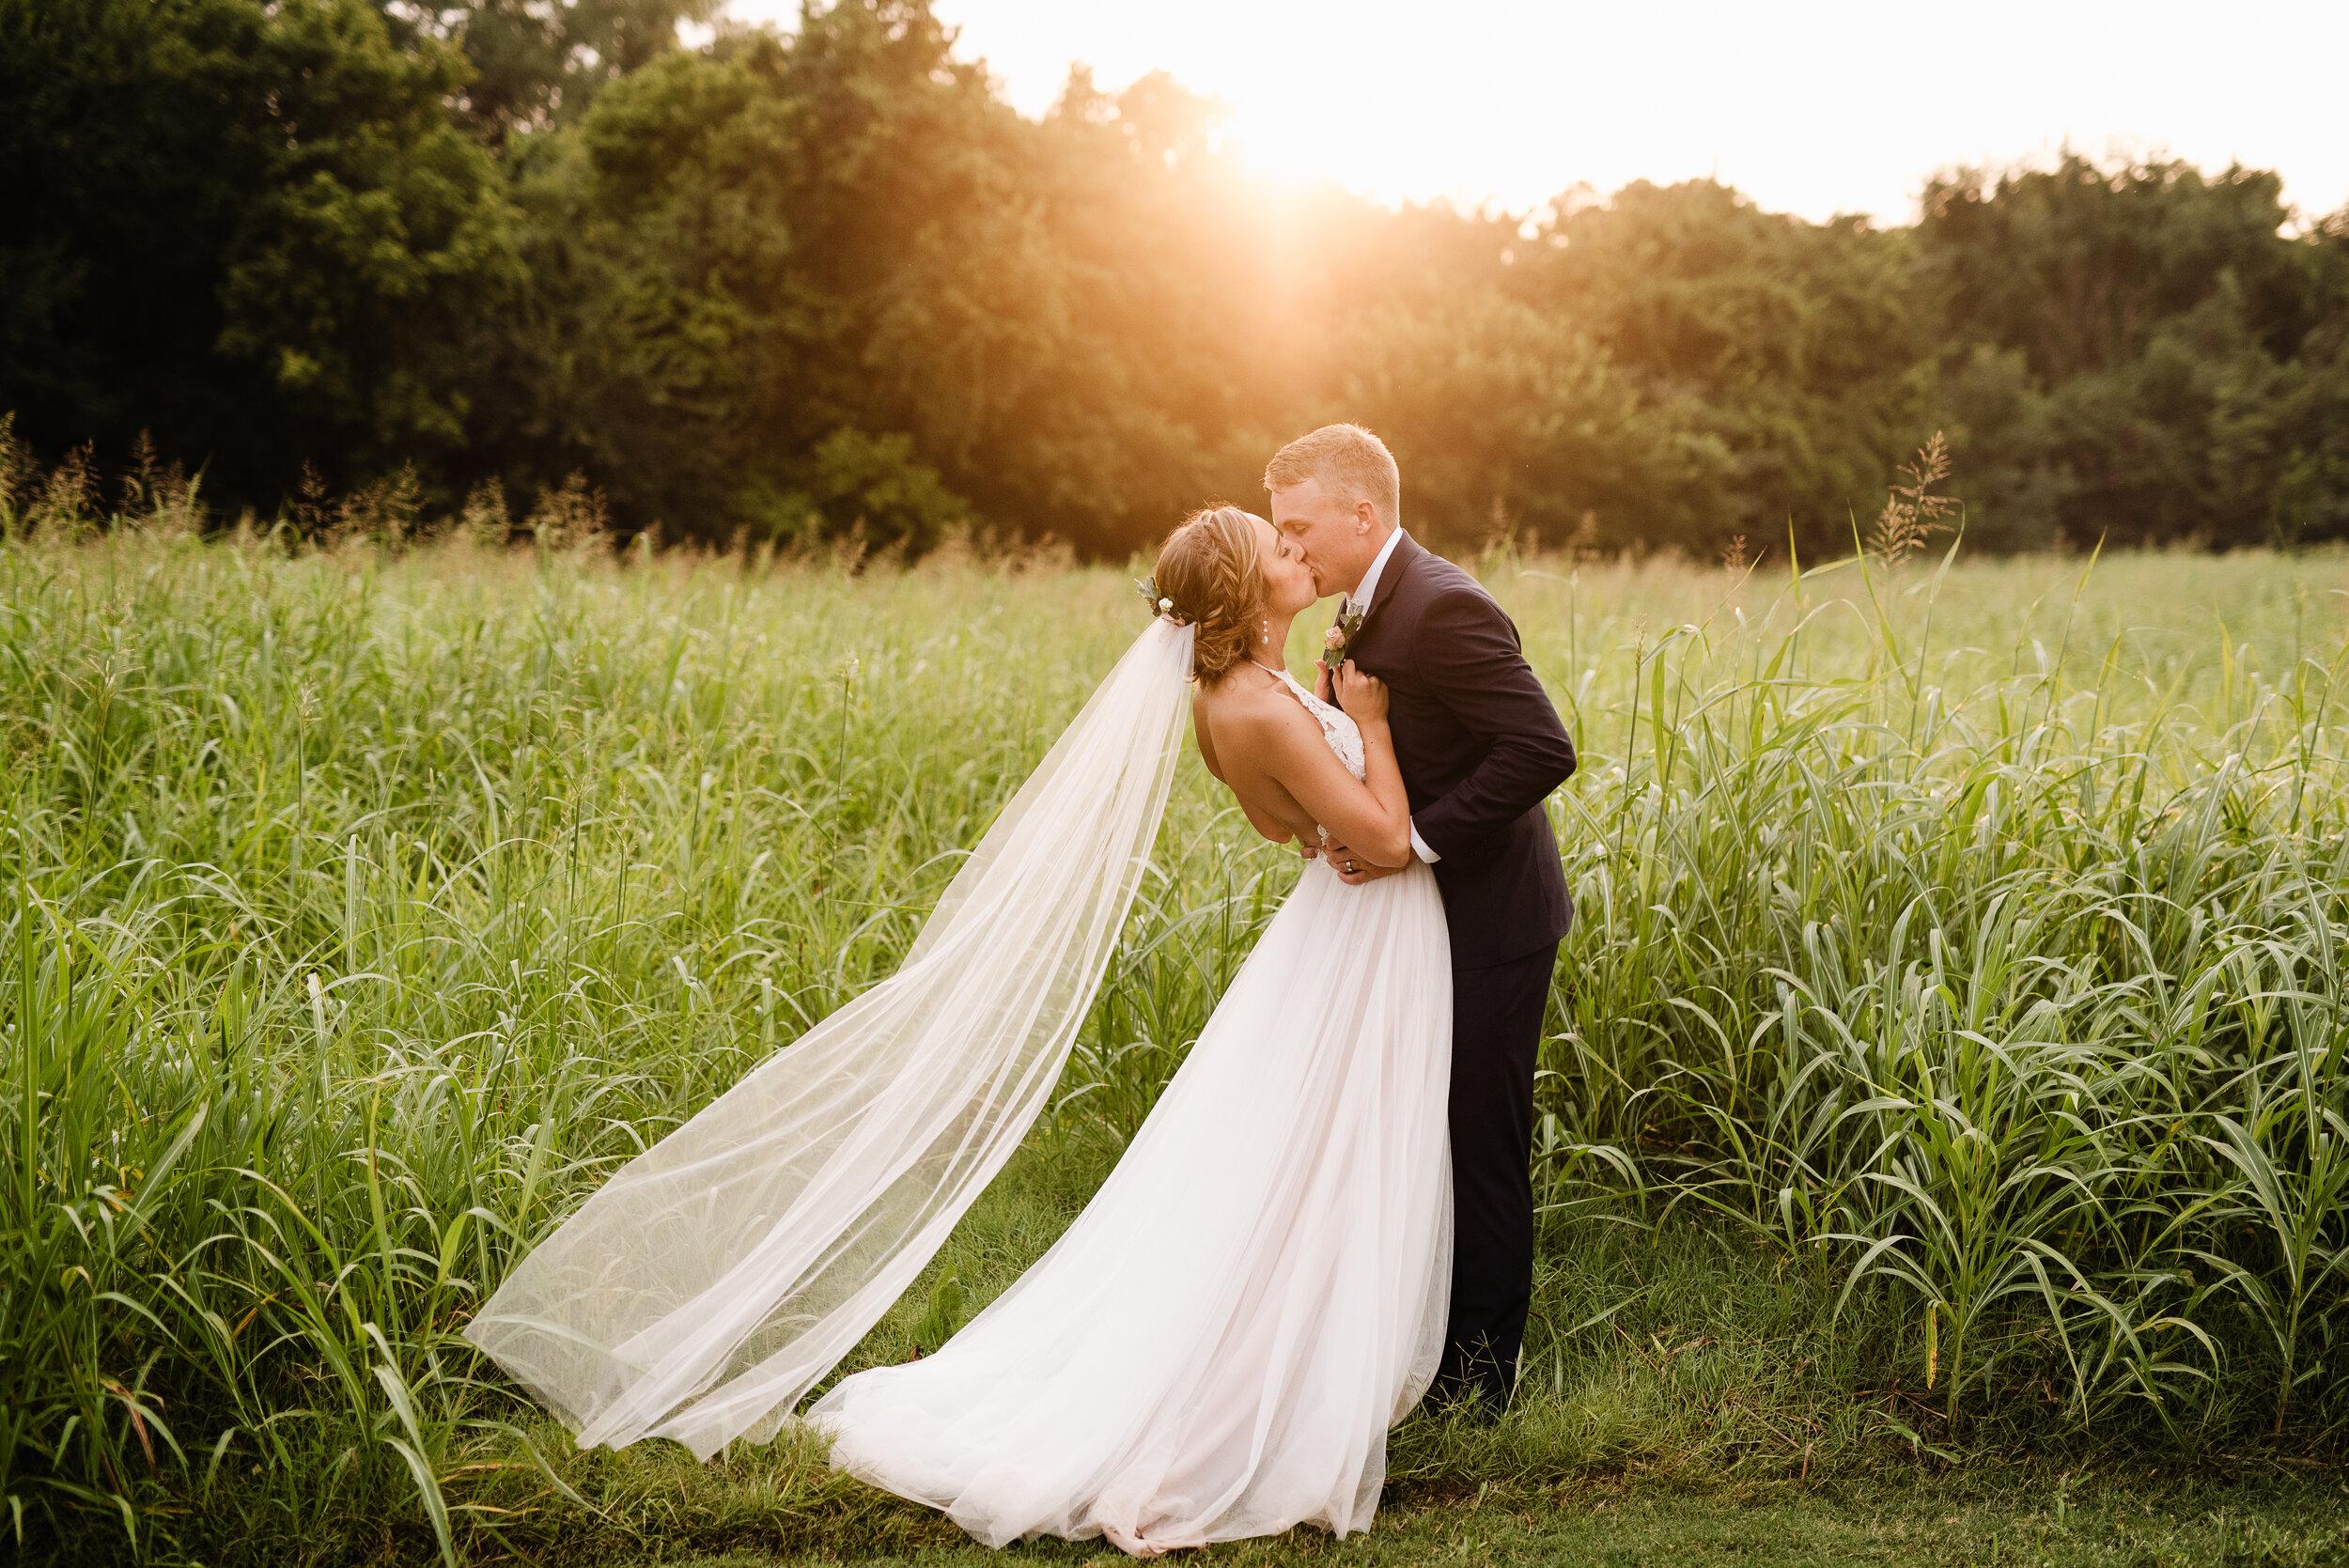 Oklahoma wedding photographer, Edmond wedding photographer, Norman wedding photographer